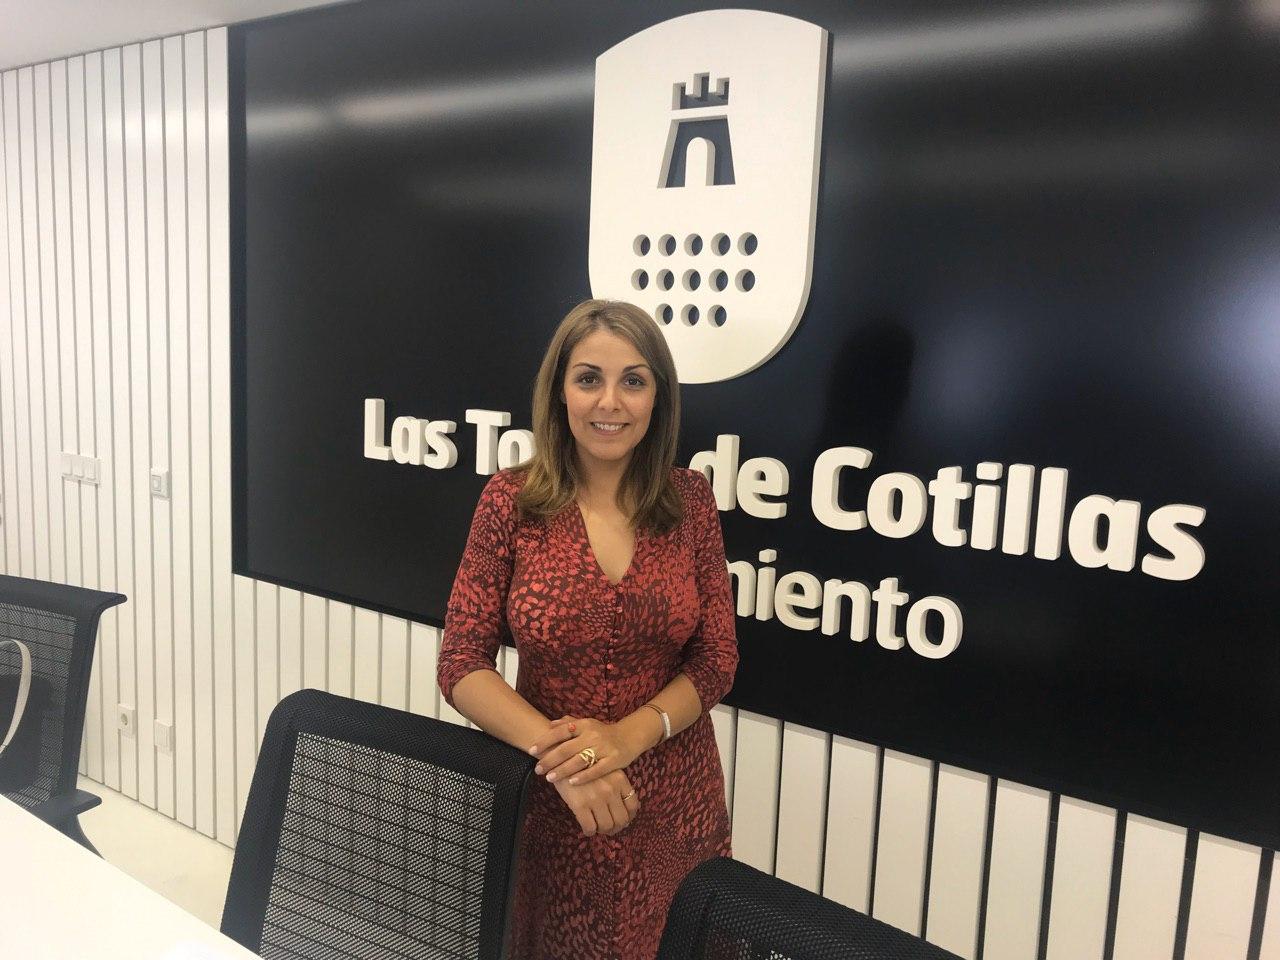 191119 Marian concejal de Cs Las Torres de Cotillas